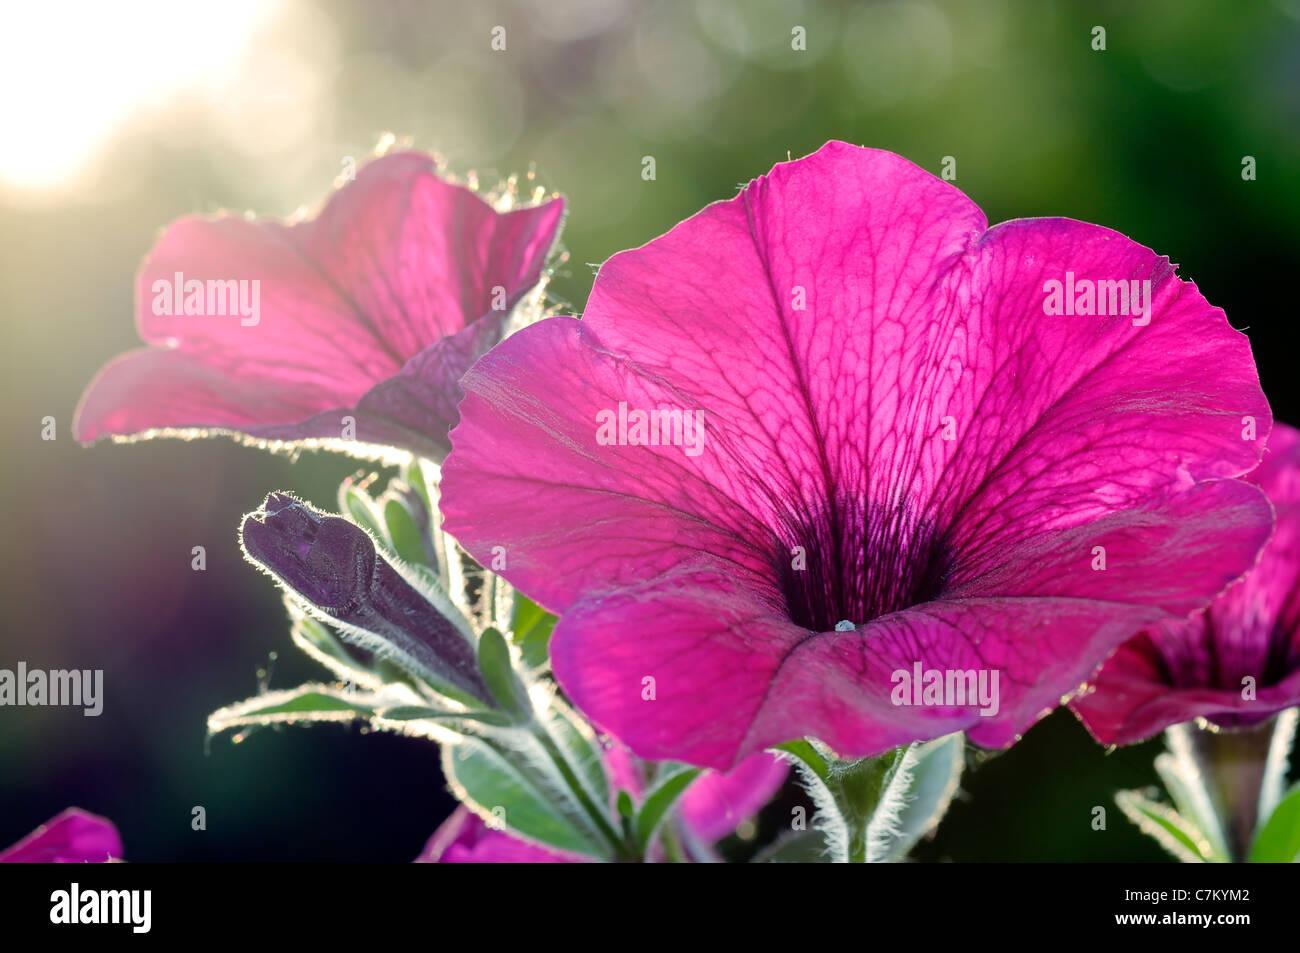 Closeup of a purple colored petunias at sunset. - Stock Image